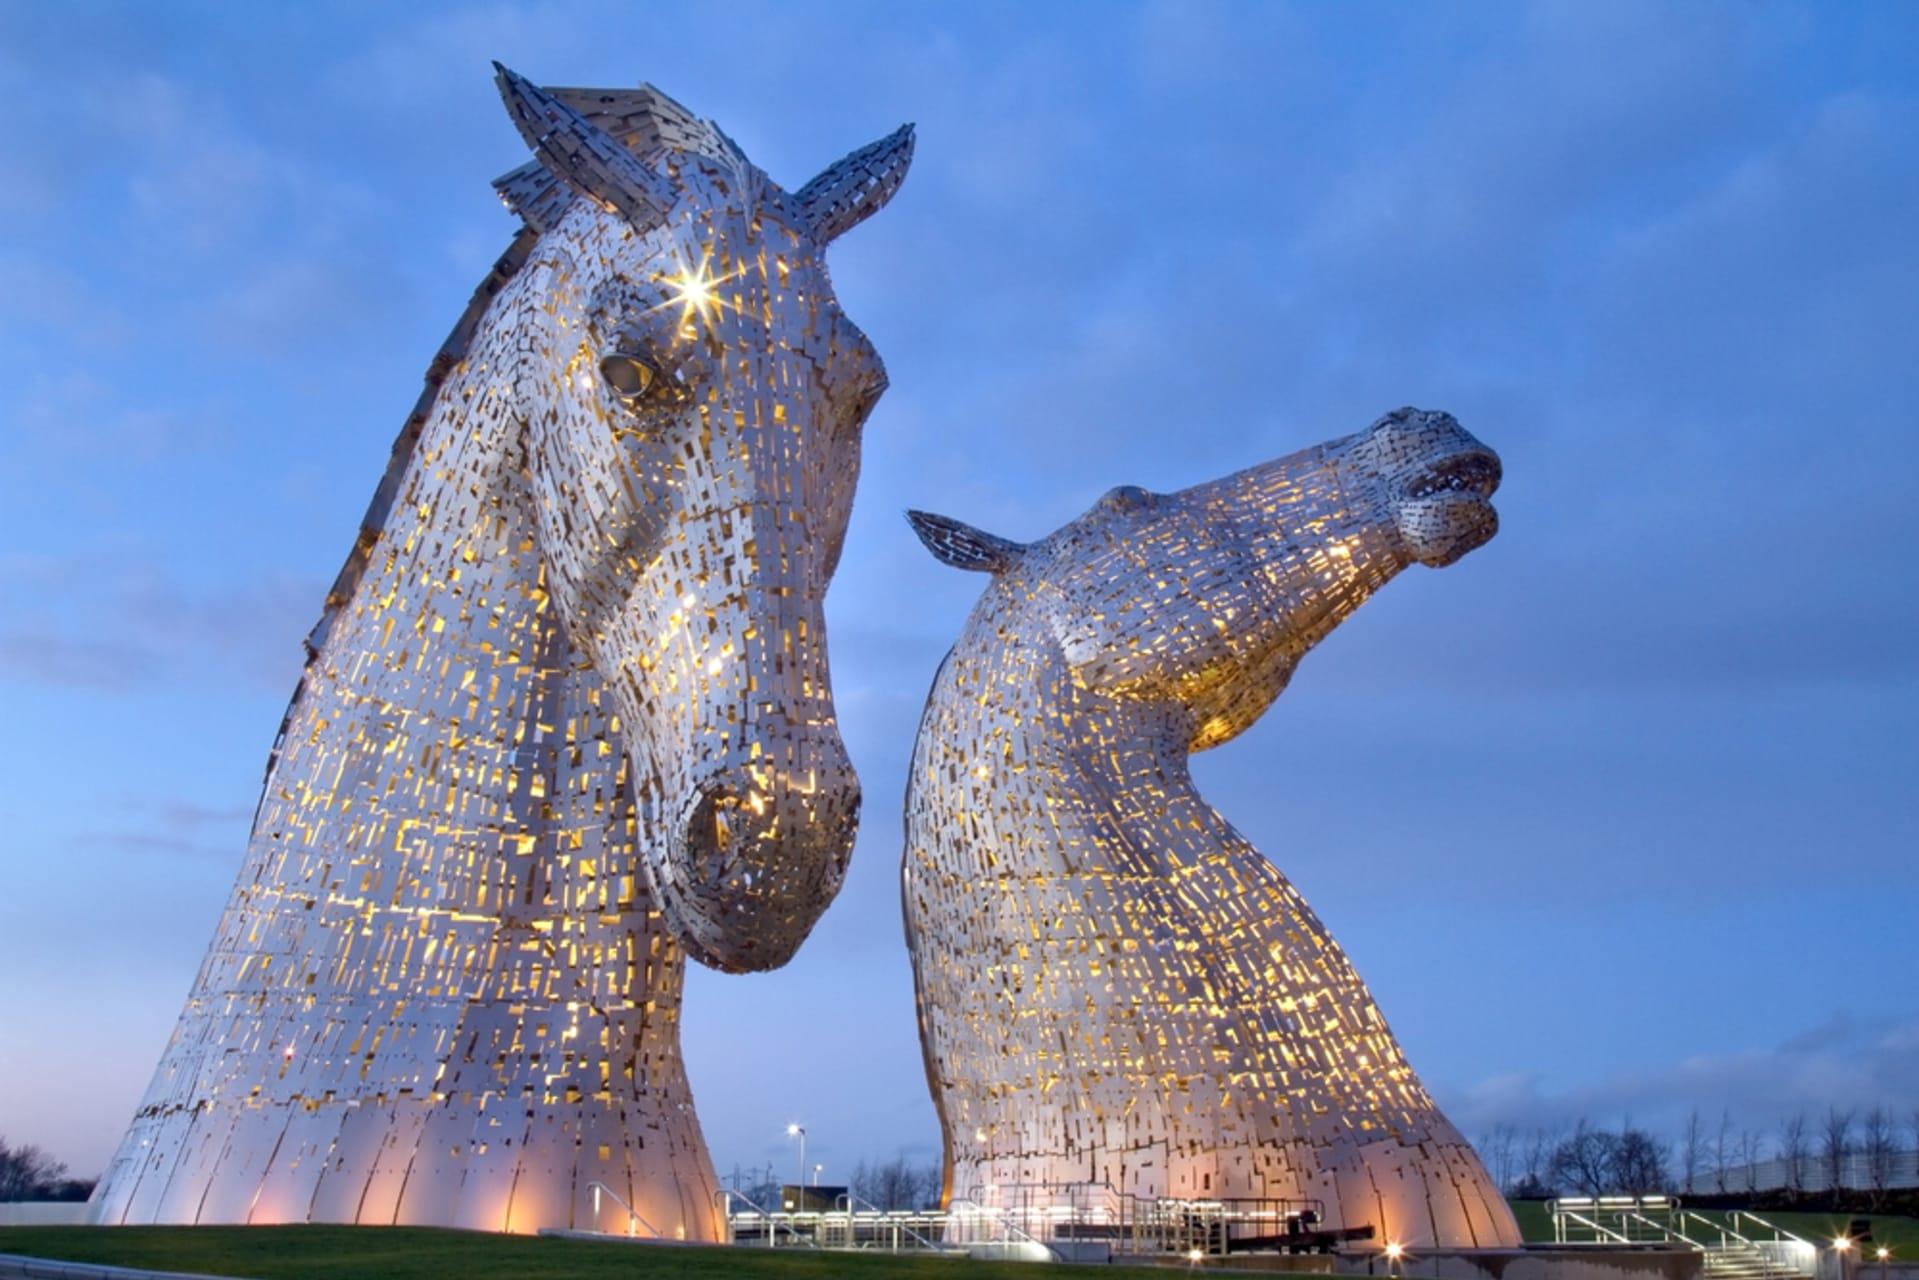 Central Scotland - Meet the Kelpies - the world's largest Equine sculptures